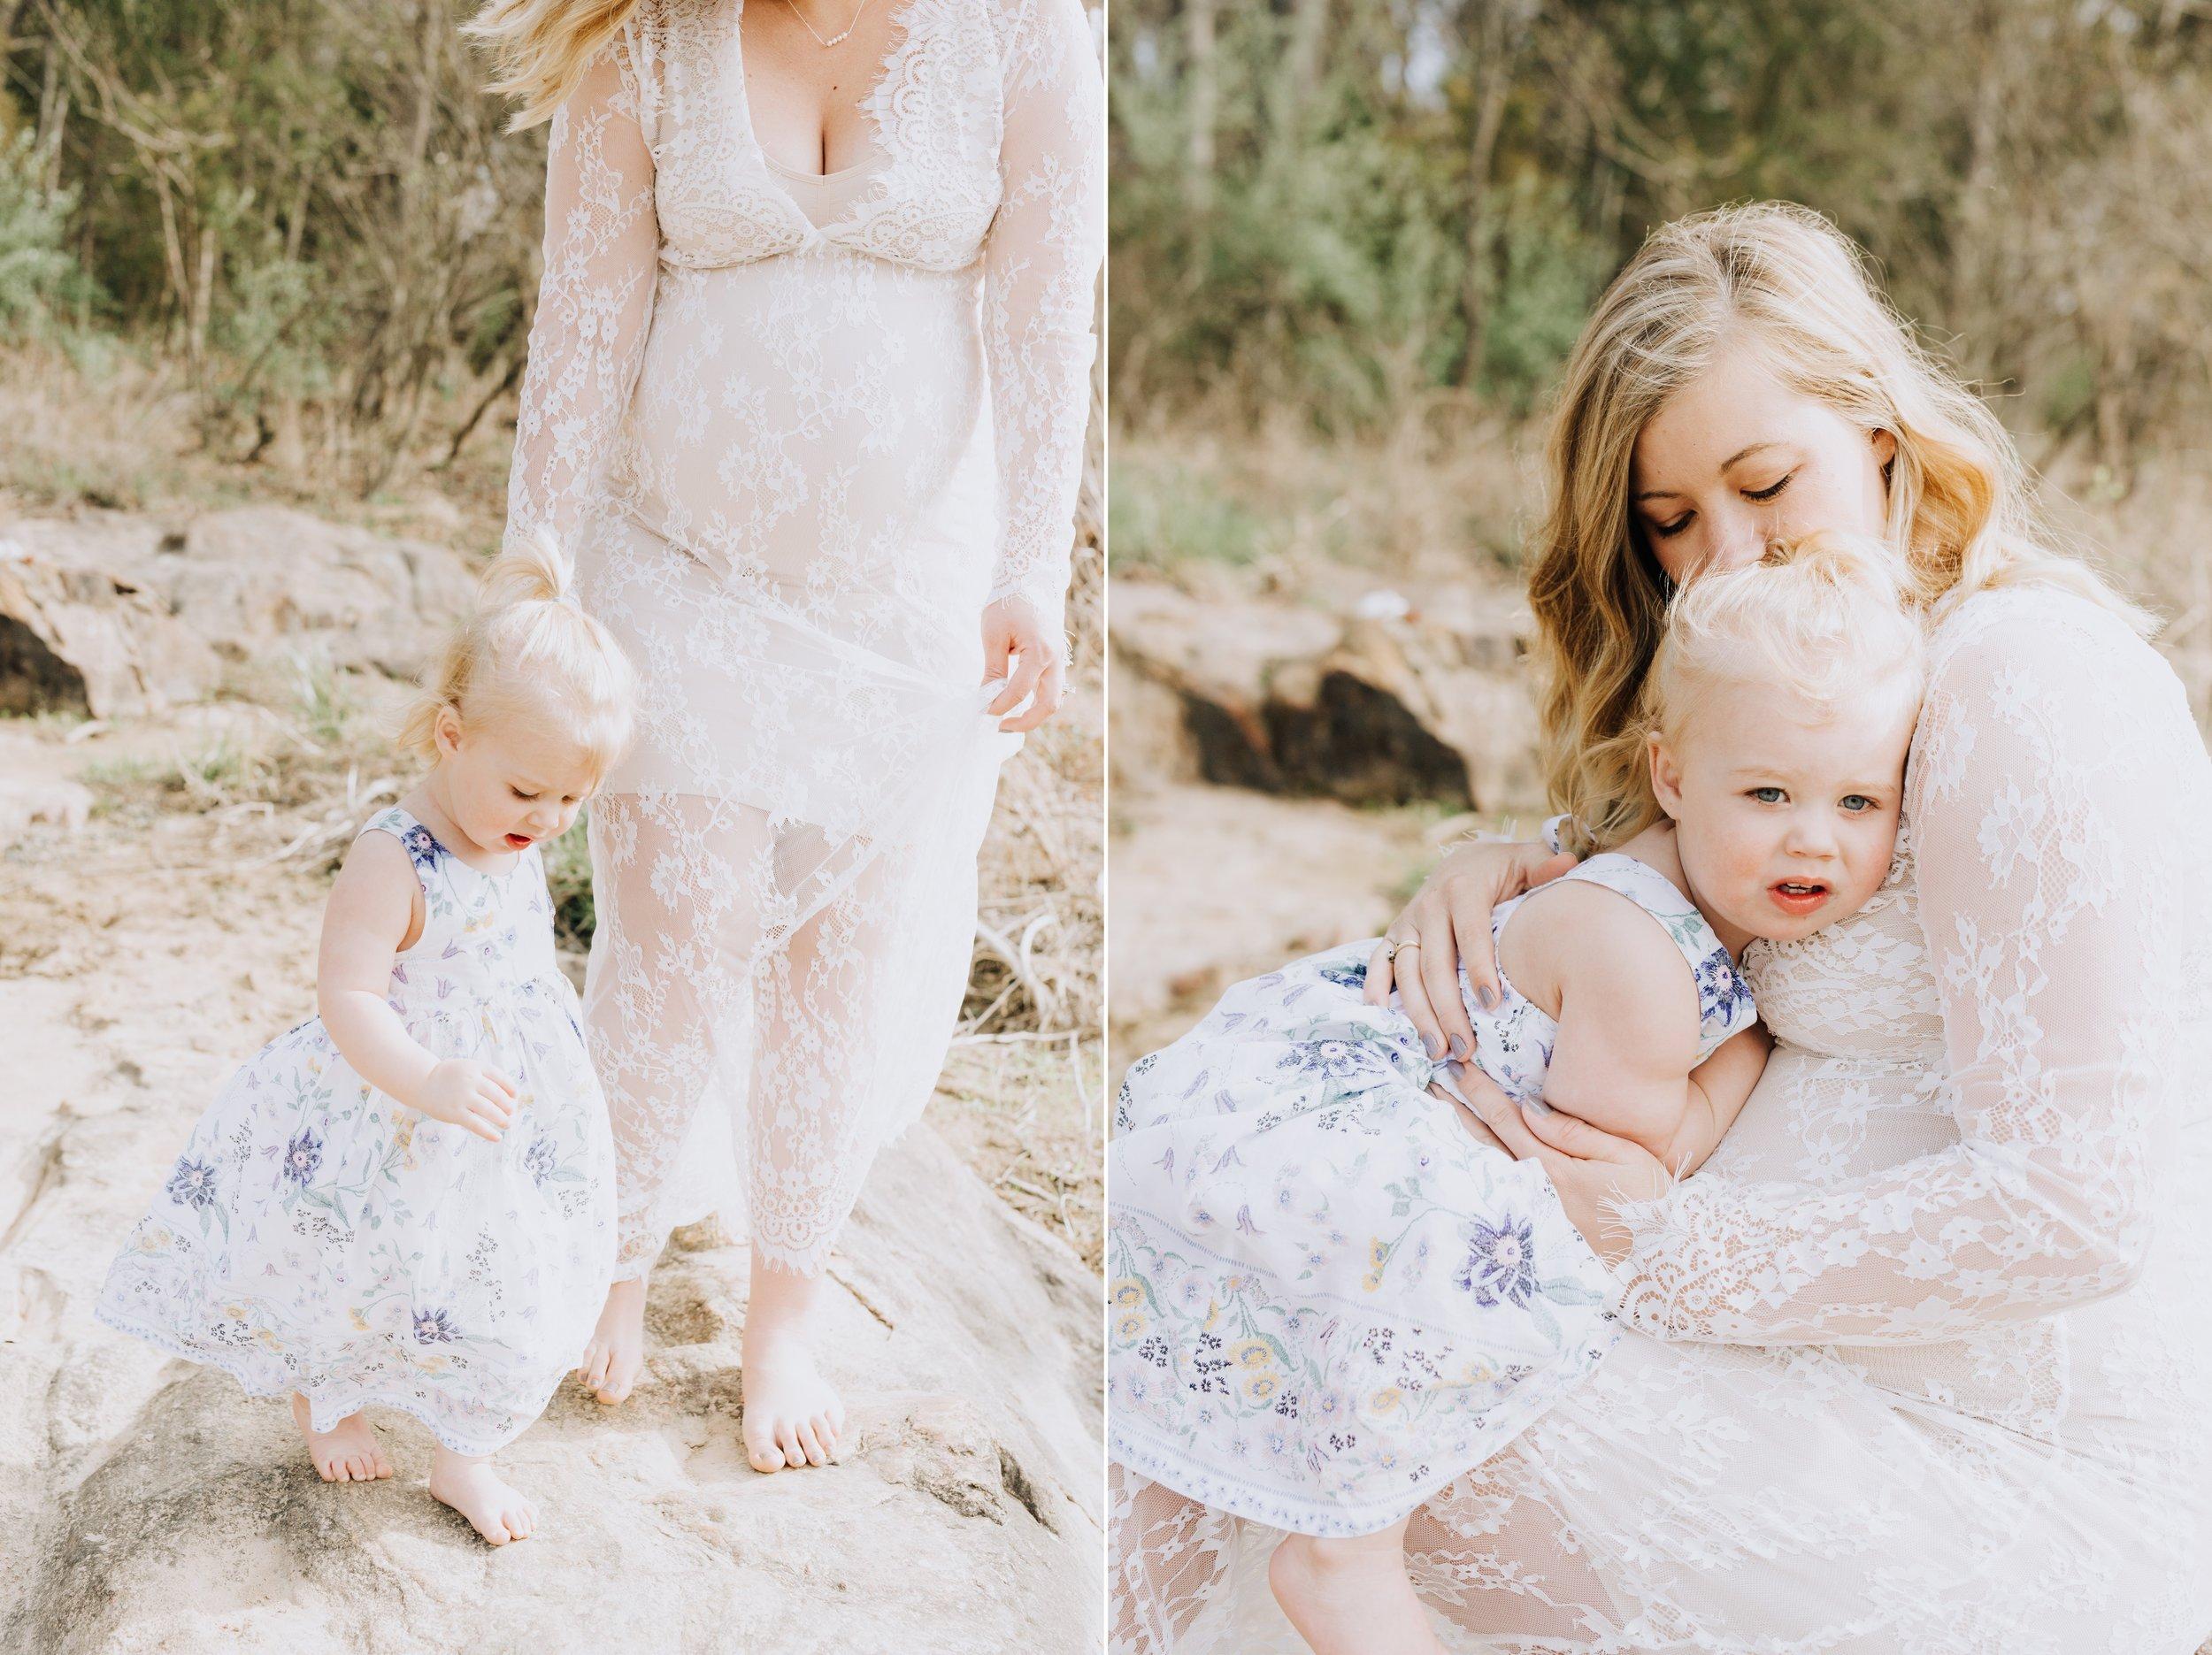 Fredericksburg_Virginia_Maternity_Photographer_Riverside (14)-horz.jpg